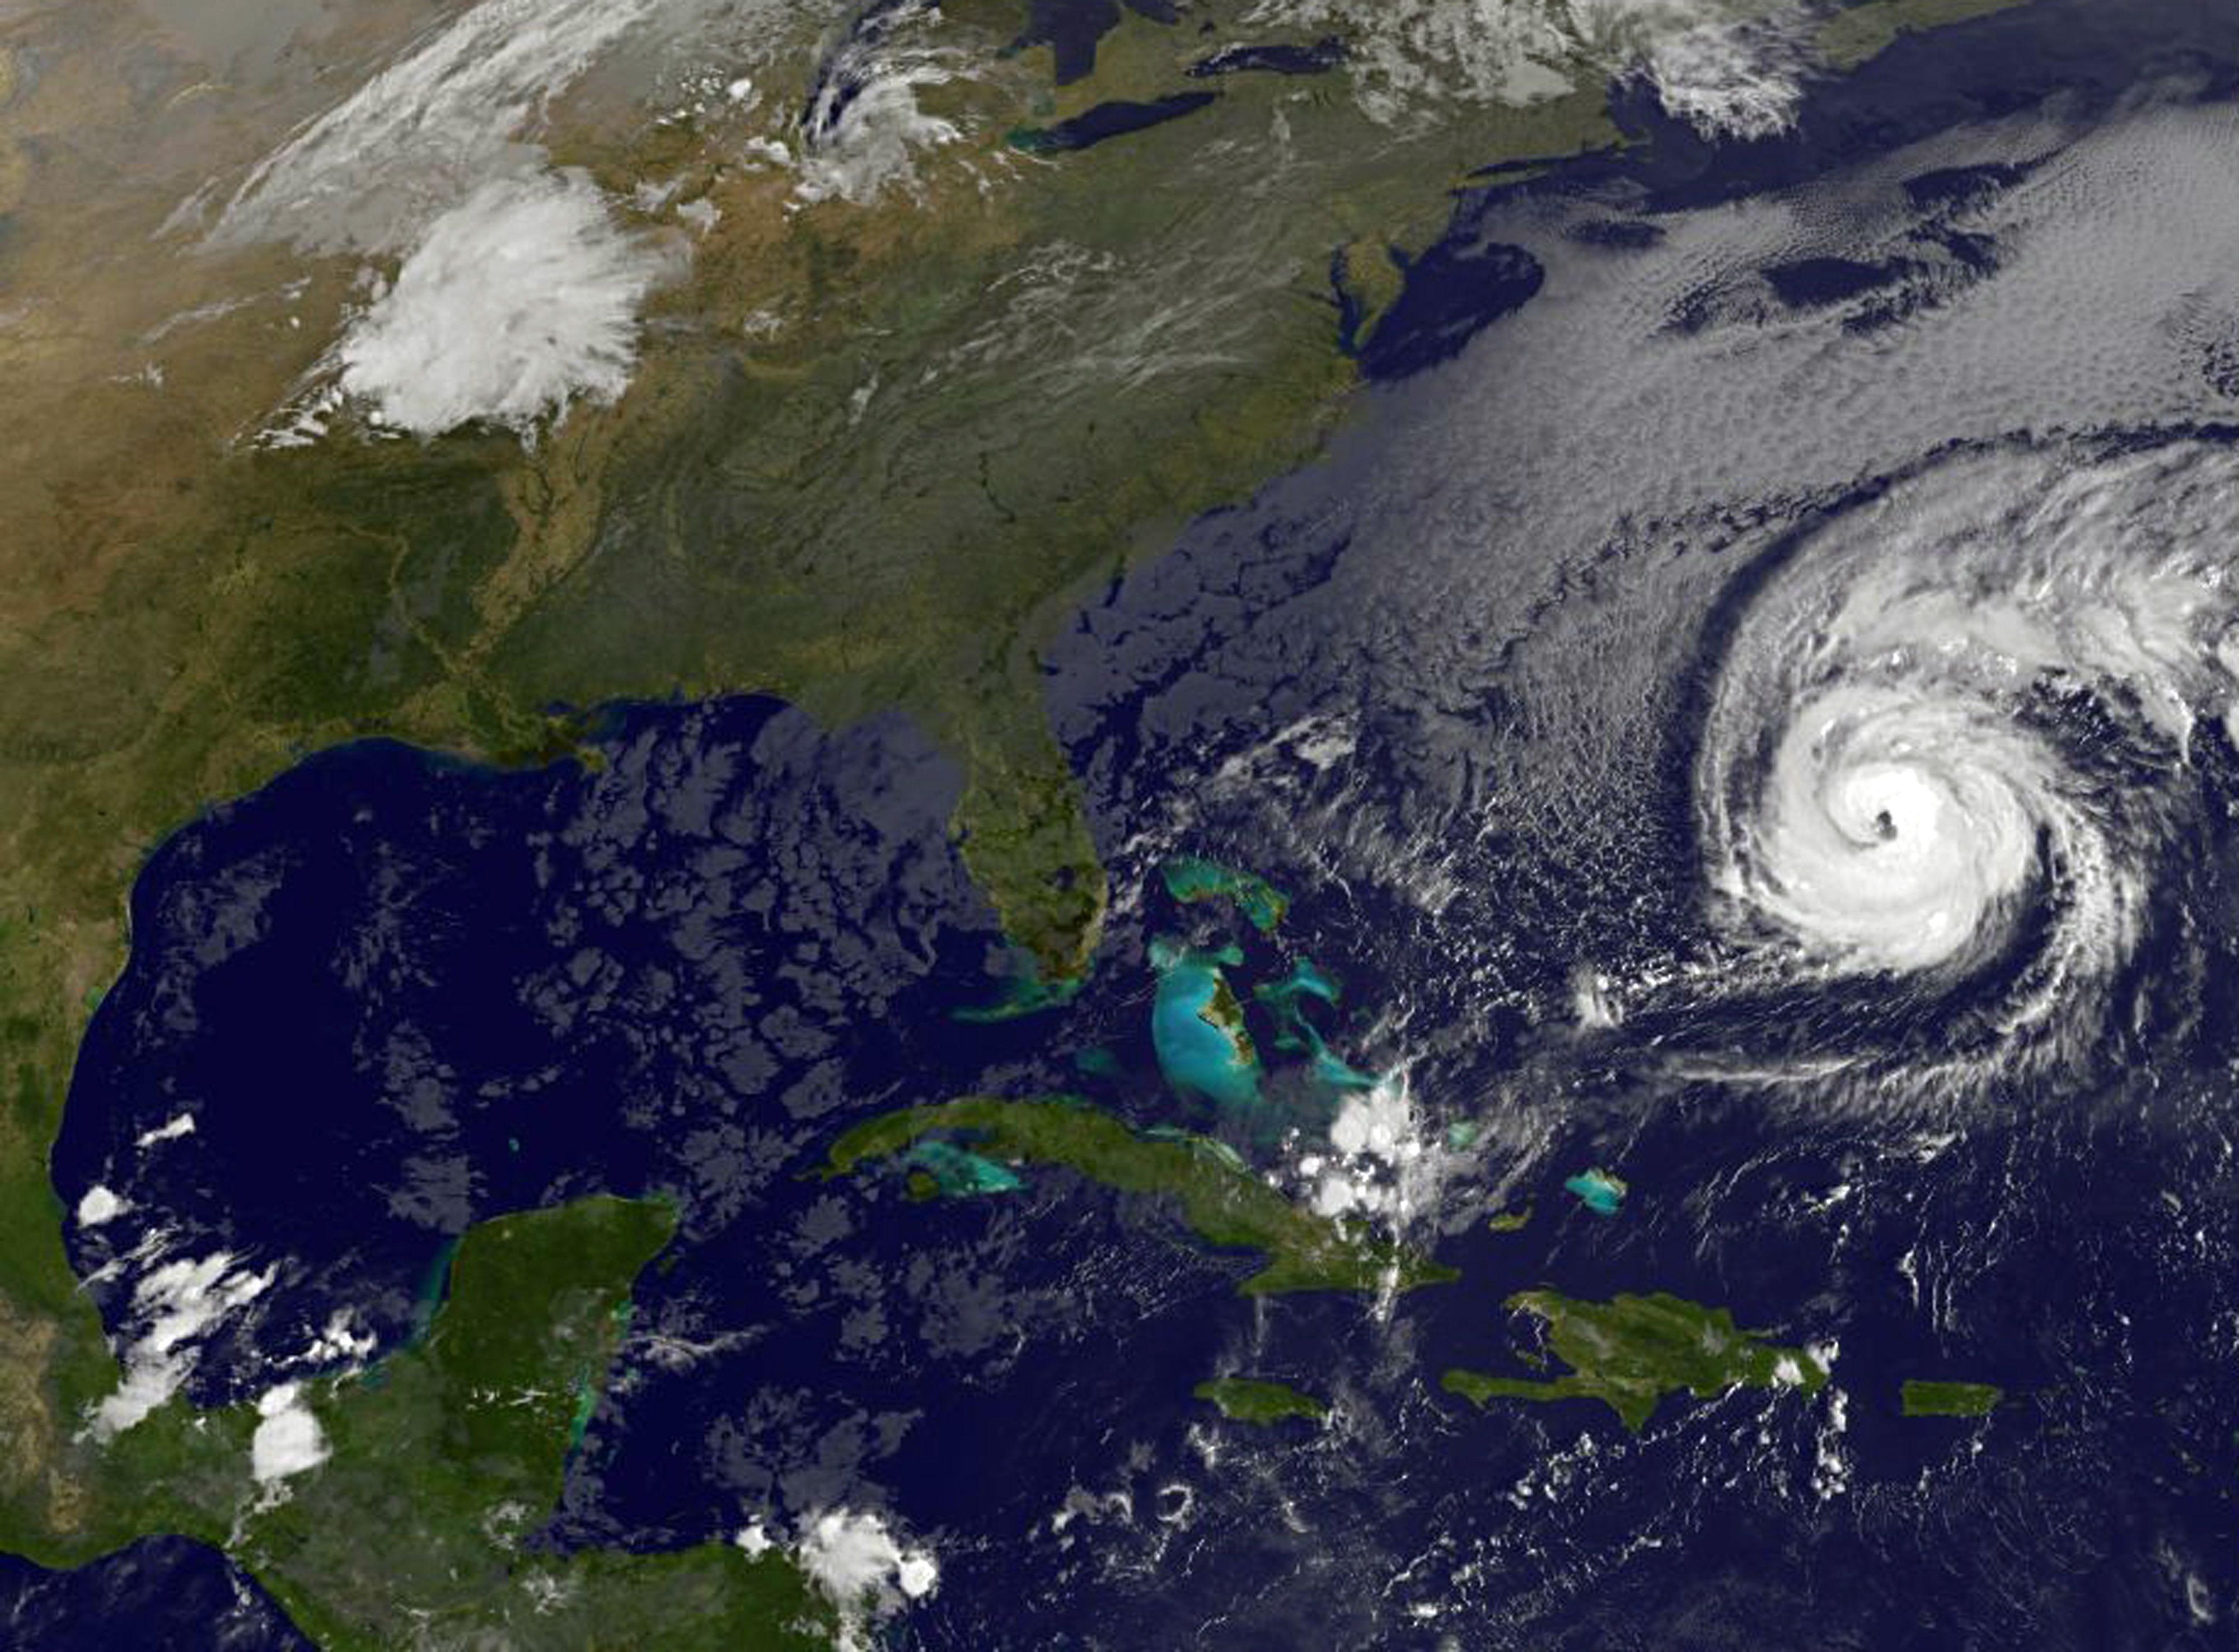 NOAA hurricane forecast: Above-normal season expected